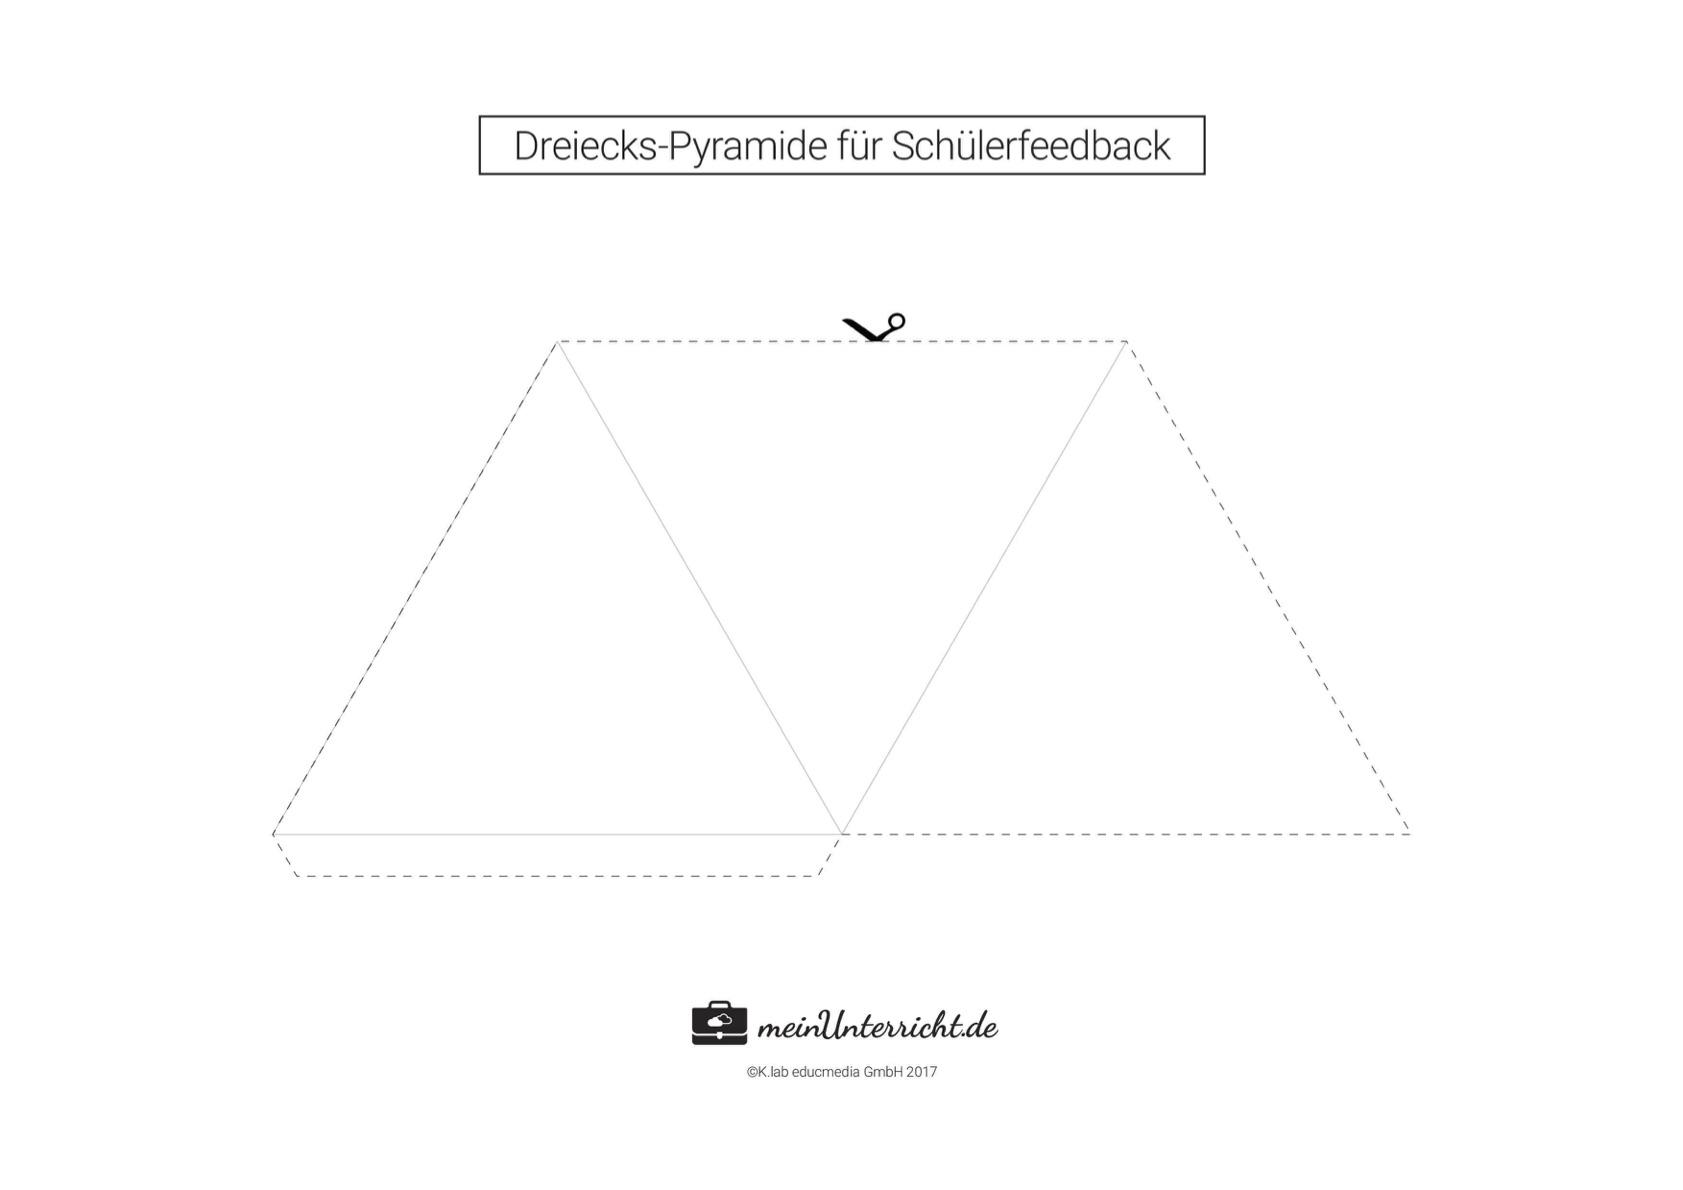 Dreiecks-Pyramide für Schülerfeedback